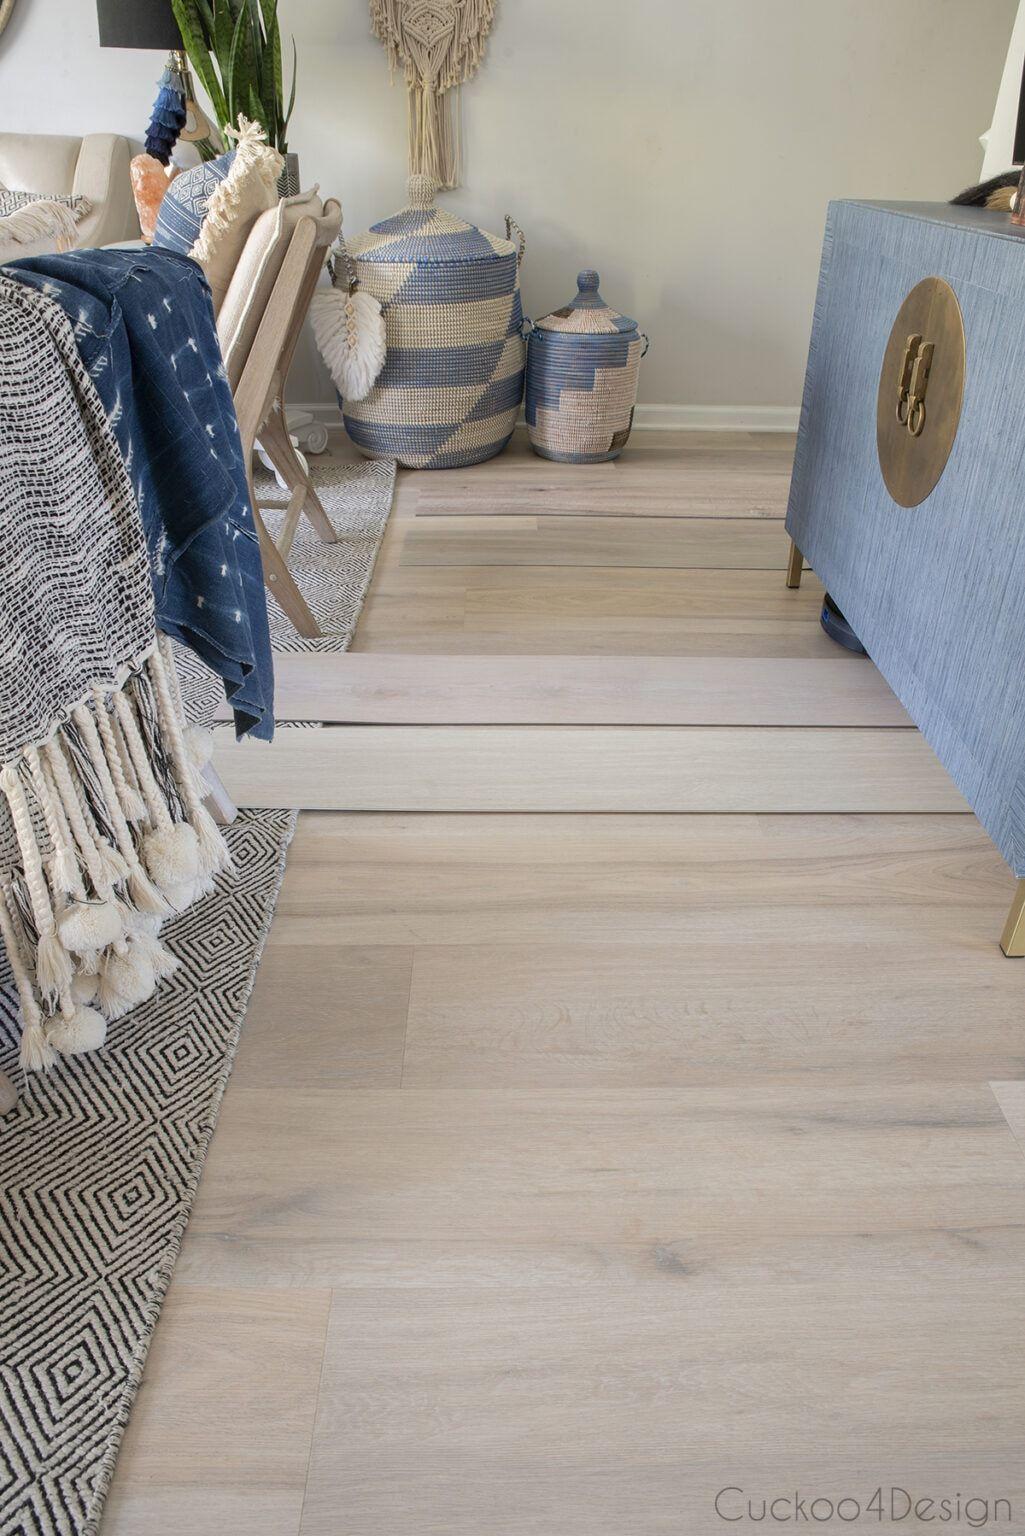 Comparing light colored wood vinyl plank flooring samples